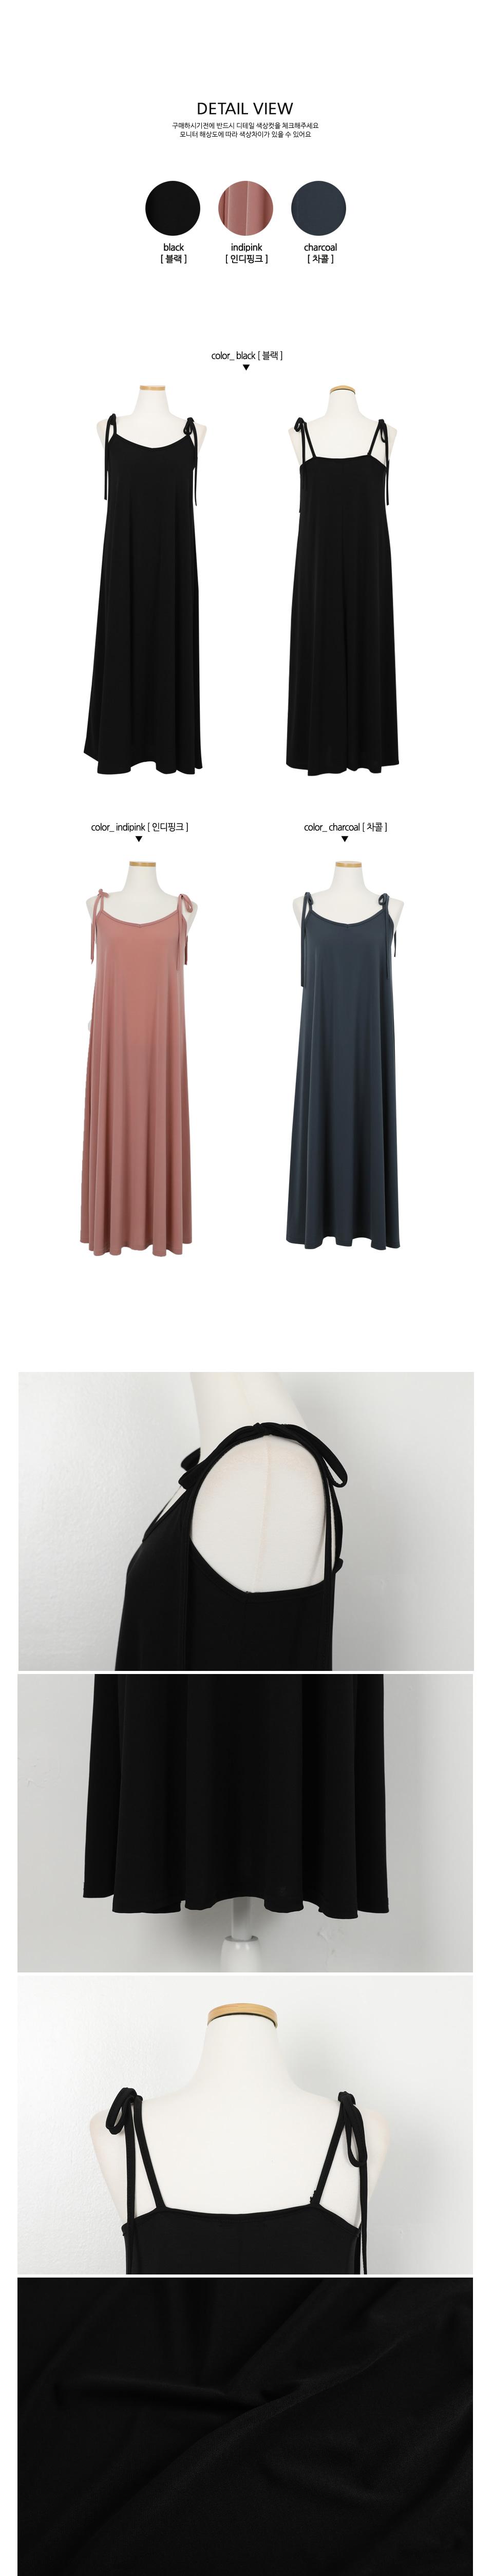 Maxi Ribbon Tension Dress